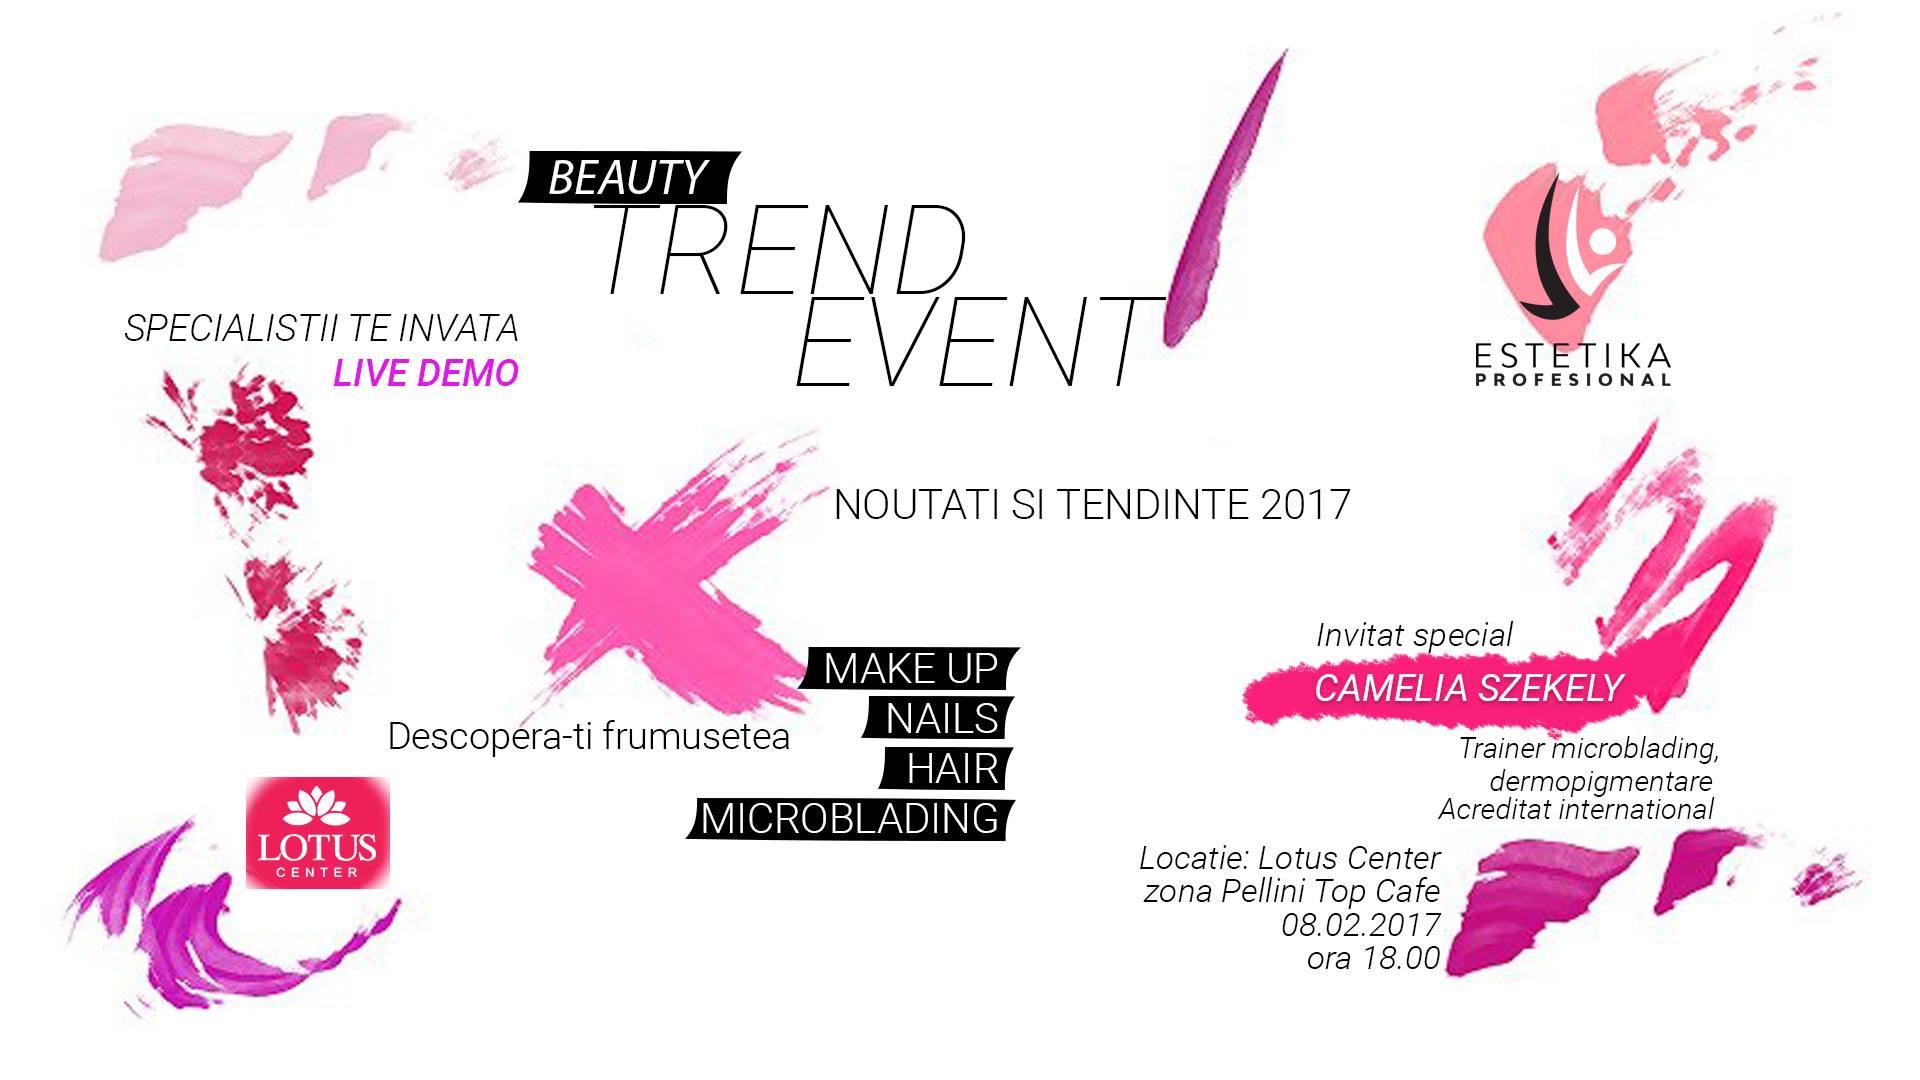 Beauty TREND by Estetika Profesional - Oradea